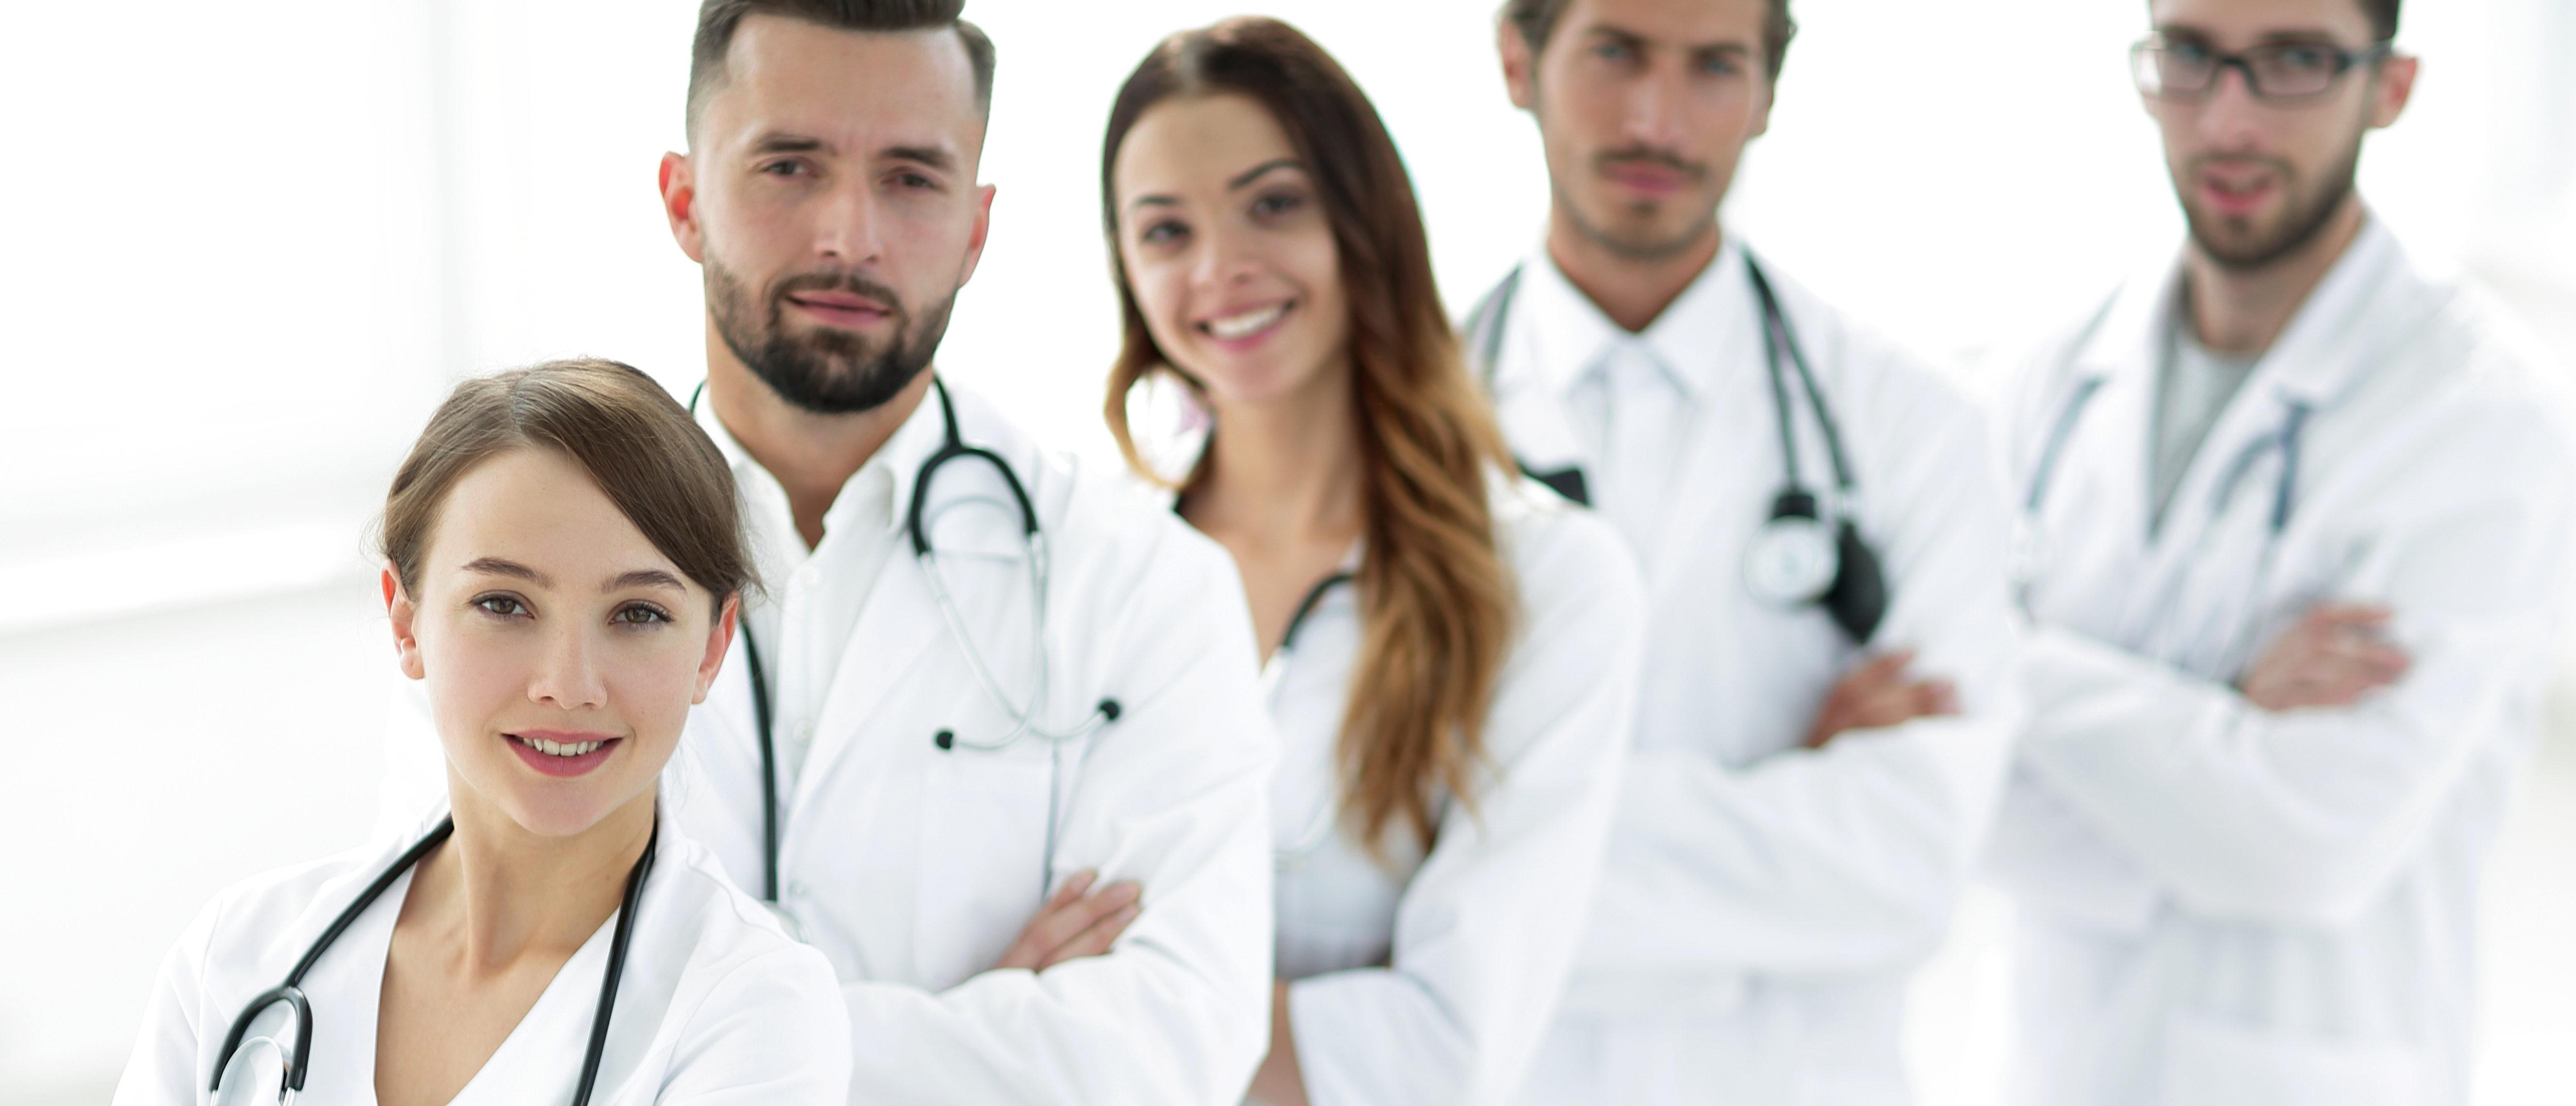 Group of doctors in white coats (Shutterstock/ASDF MEDIA)